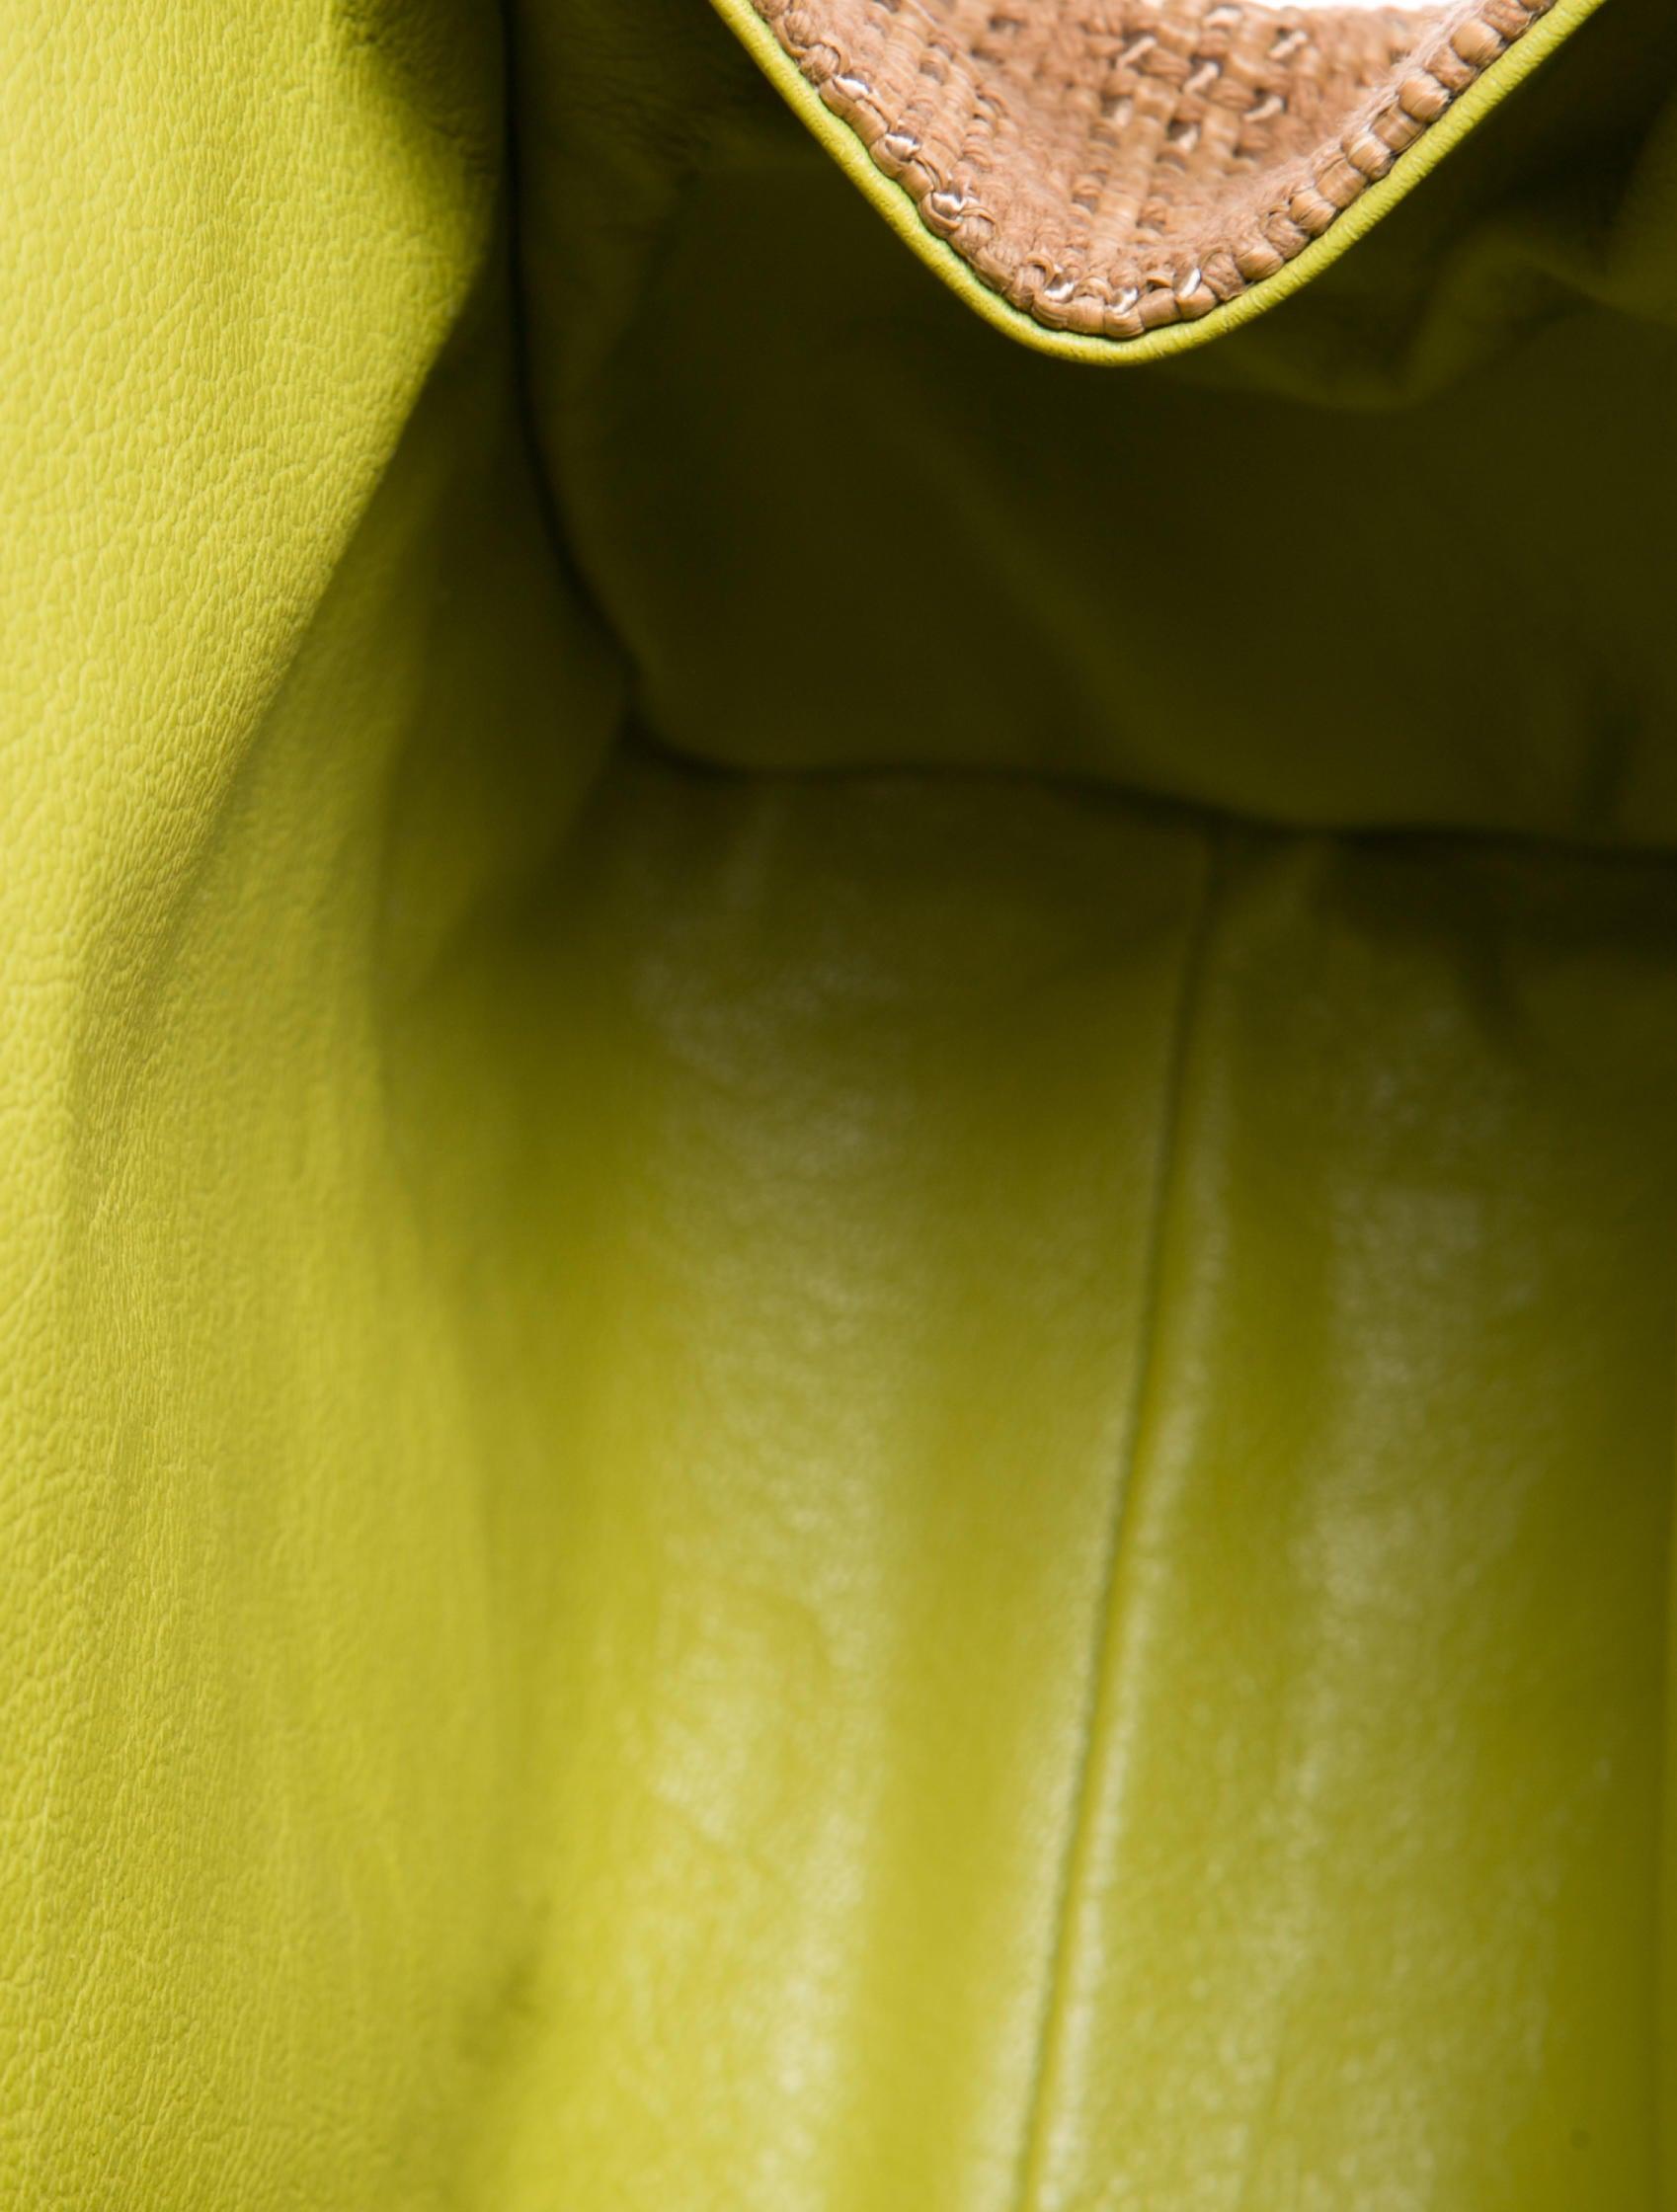 prada canvas tote pink - Prada Crocodile-Trimmed Frame Bag - Handbags - PRA94615 | The RealReal